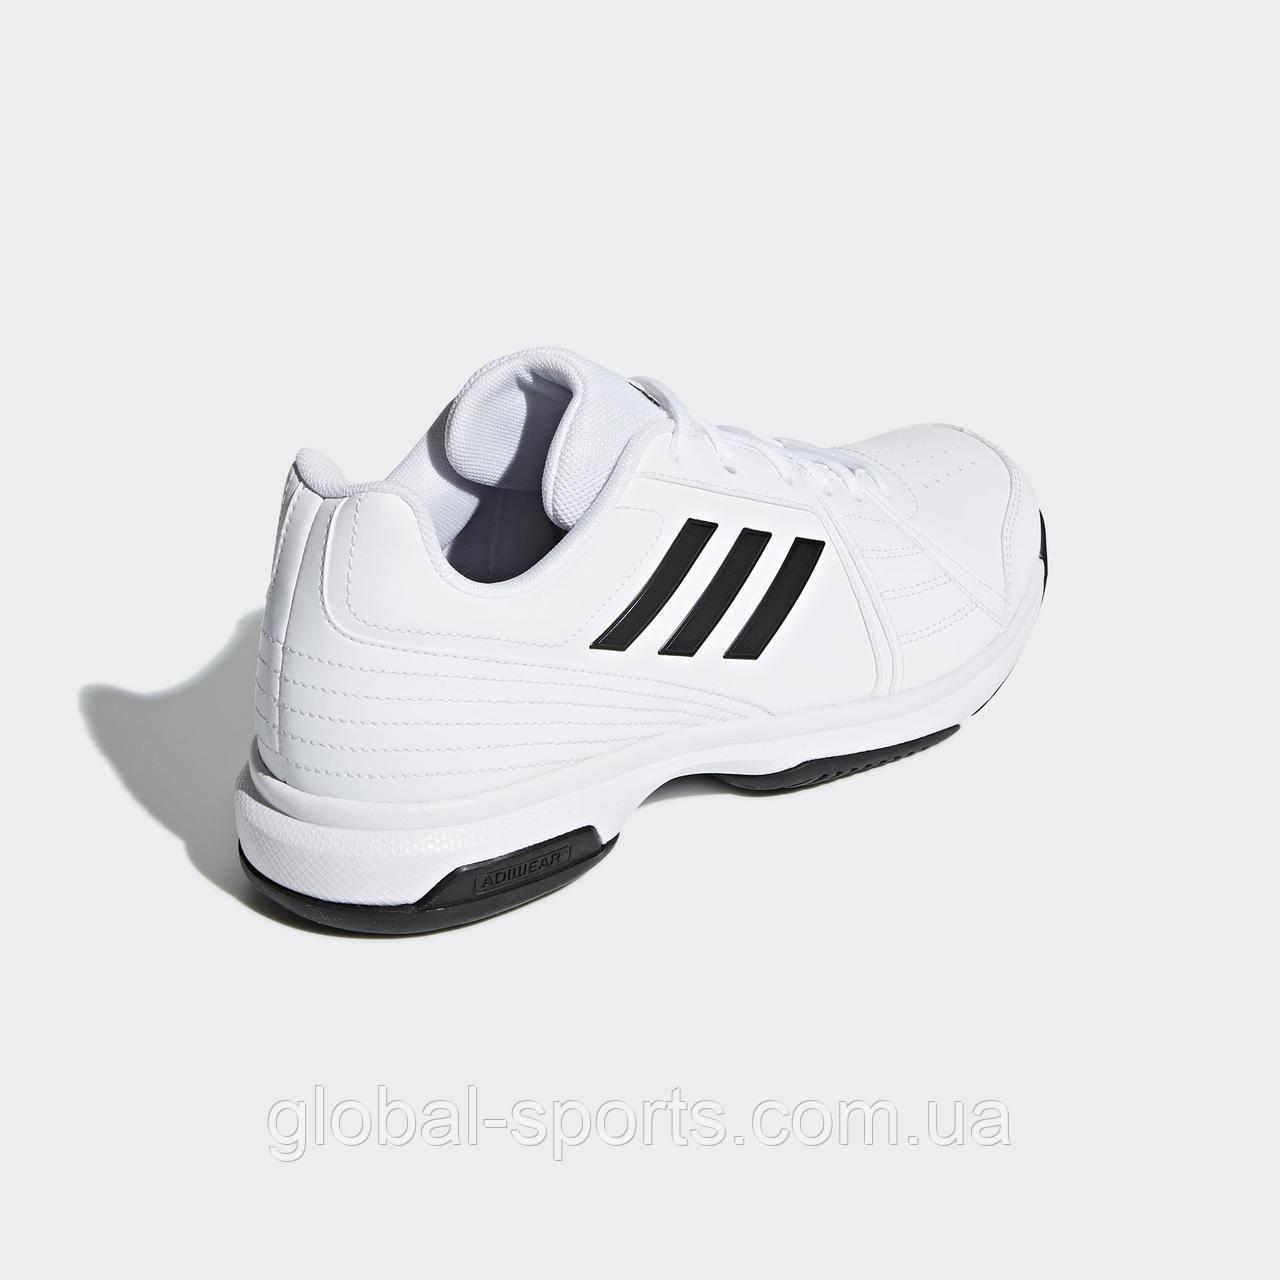 ... Мужские кроссовки Adidas Performance Approach (Артикул  BB7664), ... bb548bc80c0